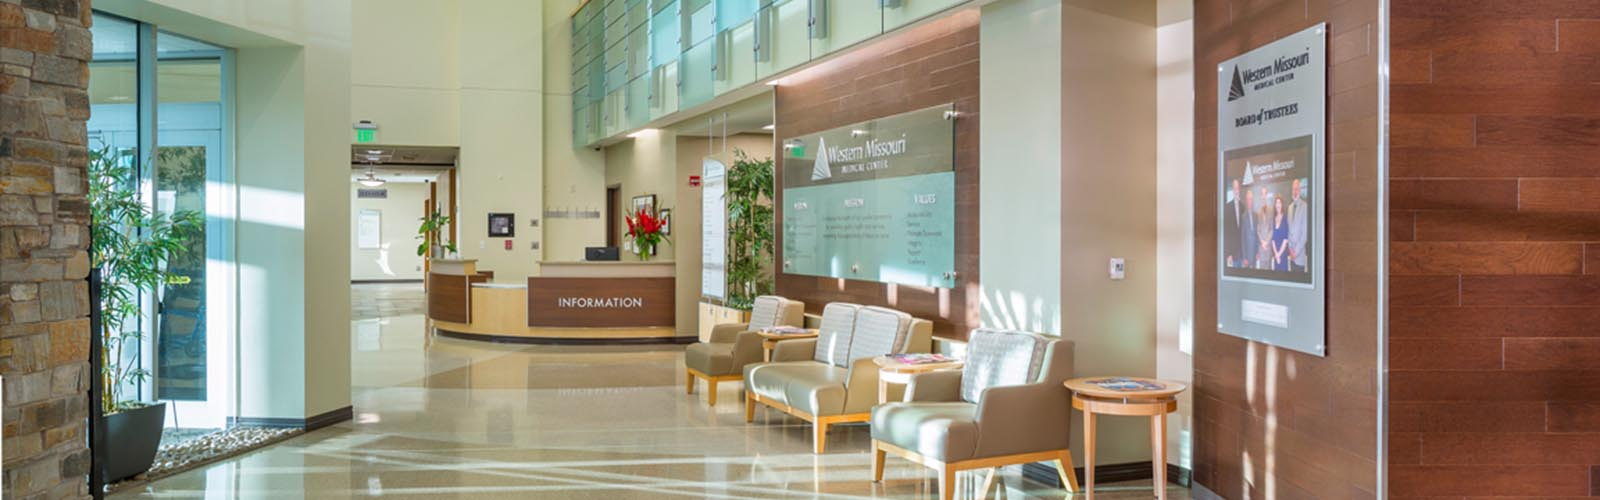 Western Missouri Medical Center Patient Tower 2